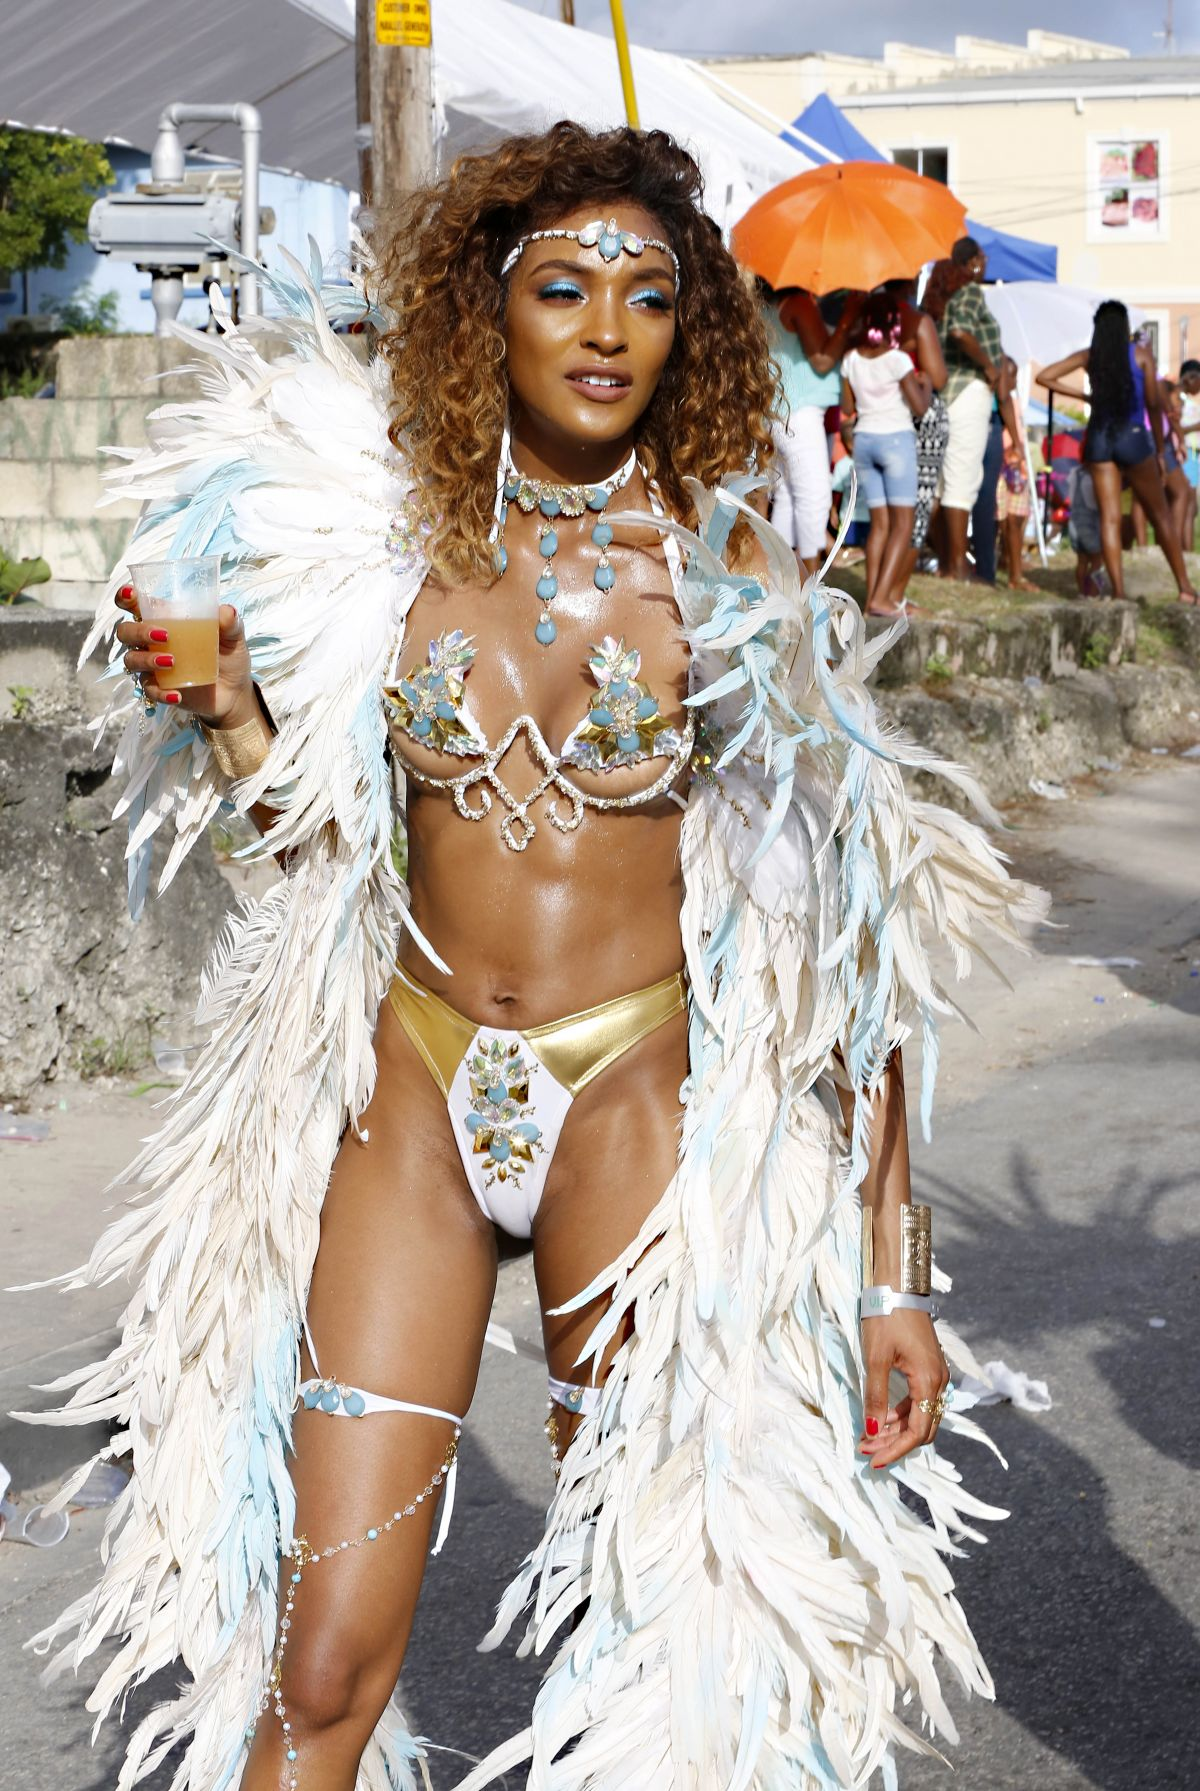 JOURDAN DUNN at Carnival in Barbados 08/07/2017